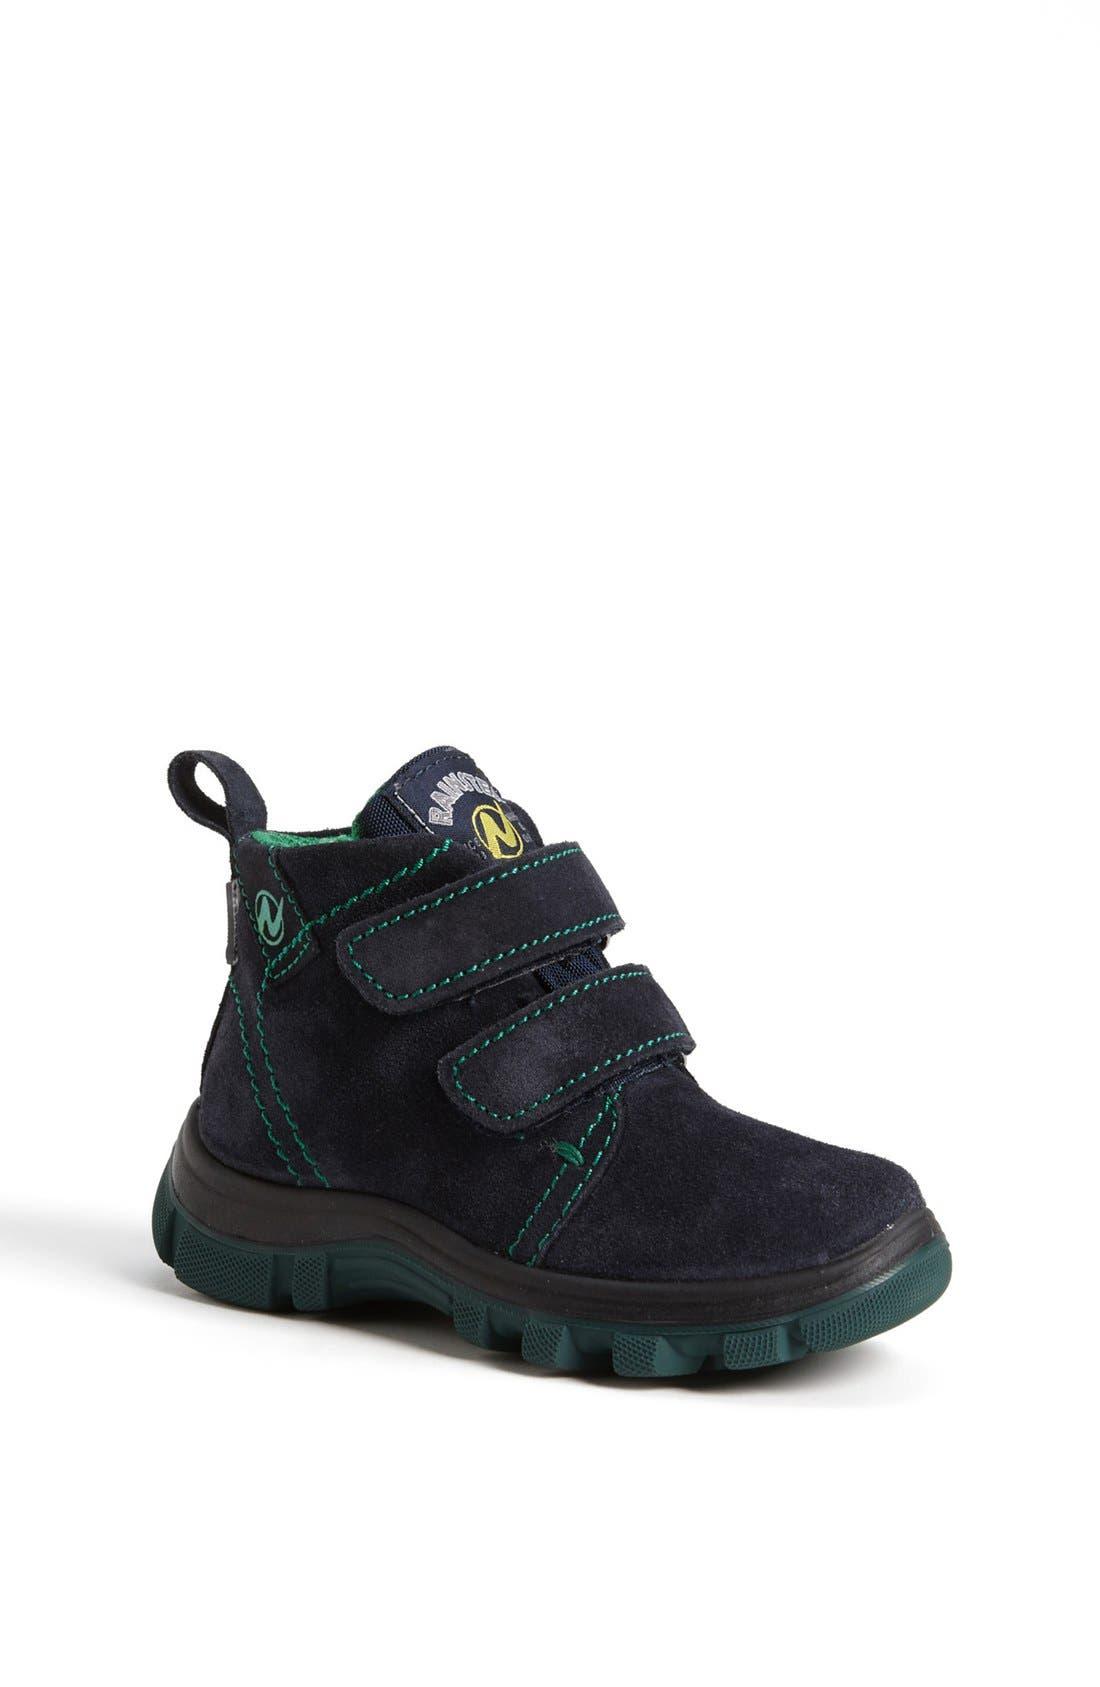 Alternate Image 1 Selected - Naturino 'Bakutis Rainstep' Waterproof Boot (Walker, Toddler & Little Kid)